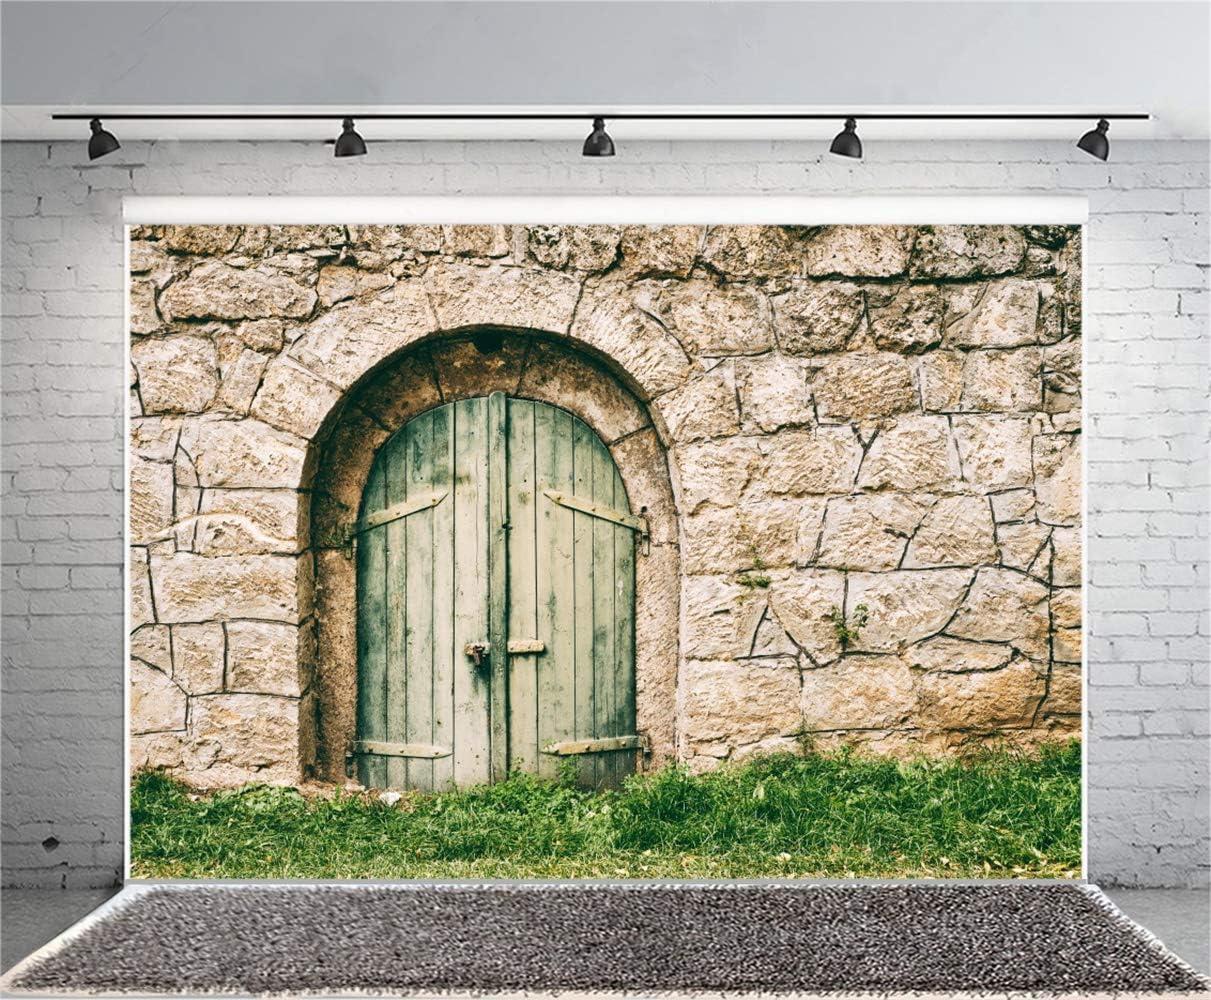 Laeacco 10x7ft Old Cellar Door Front Vinyl Photography Background Weathered Faded Padlock Green Wooden Door Rustic Stone Wall Backdrop Child Adult Cowboy Portrait Shoot Western Studio Props